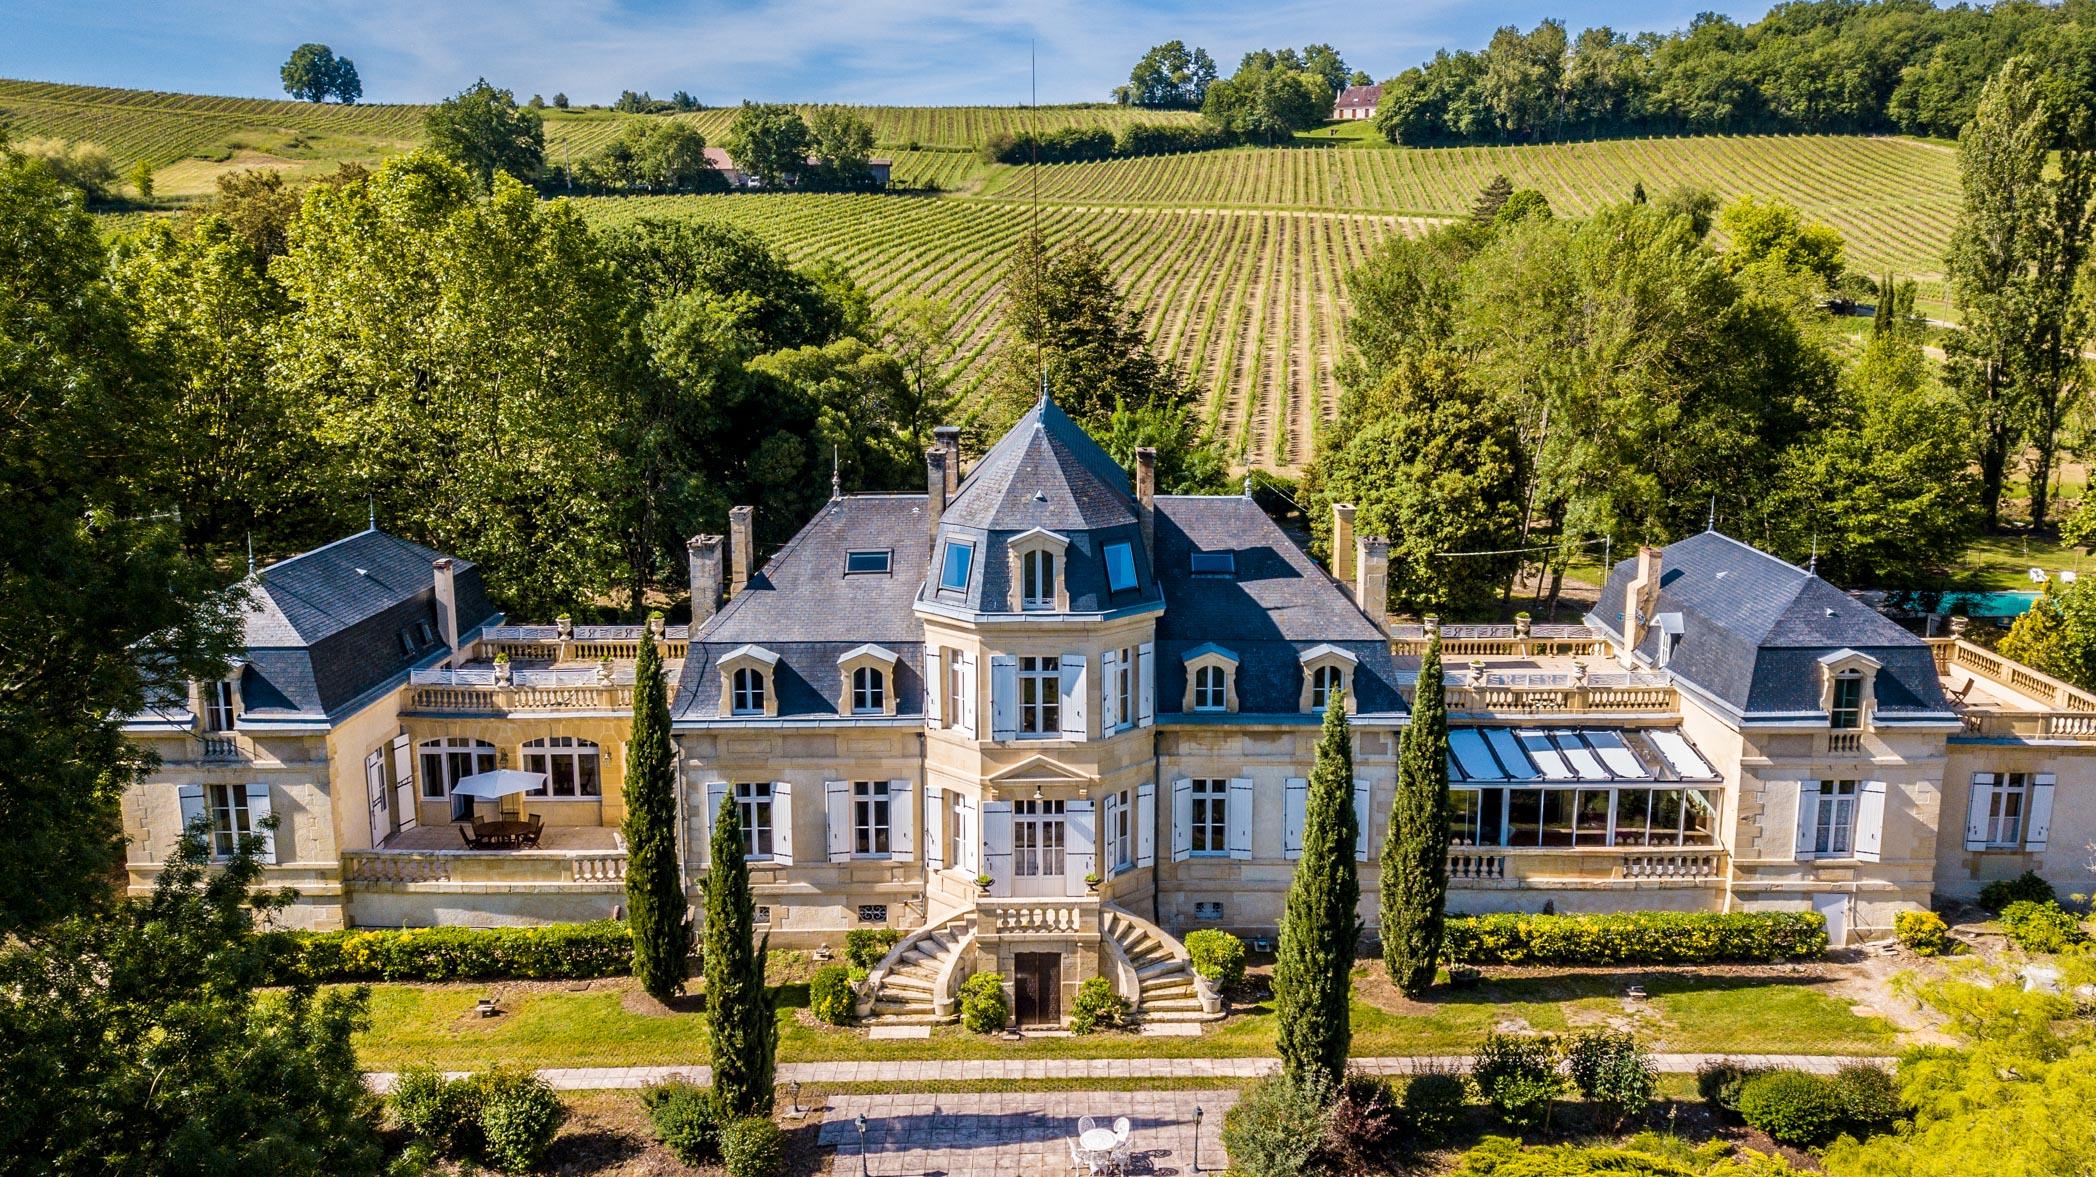 Chateau Rauly location bergerac Monbazillac